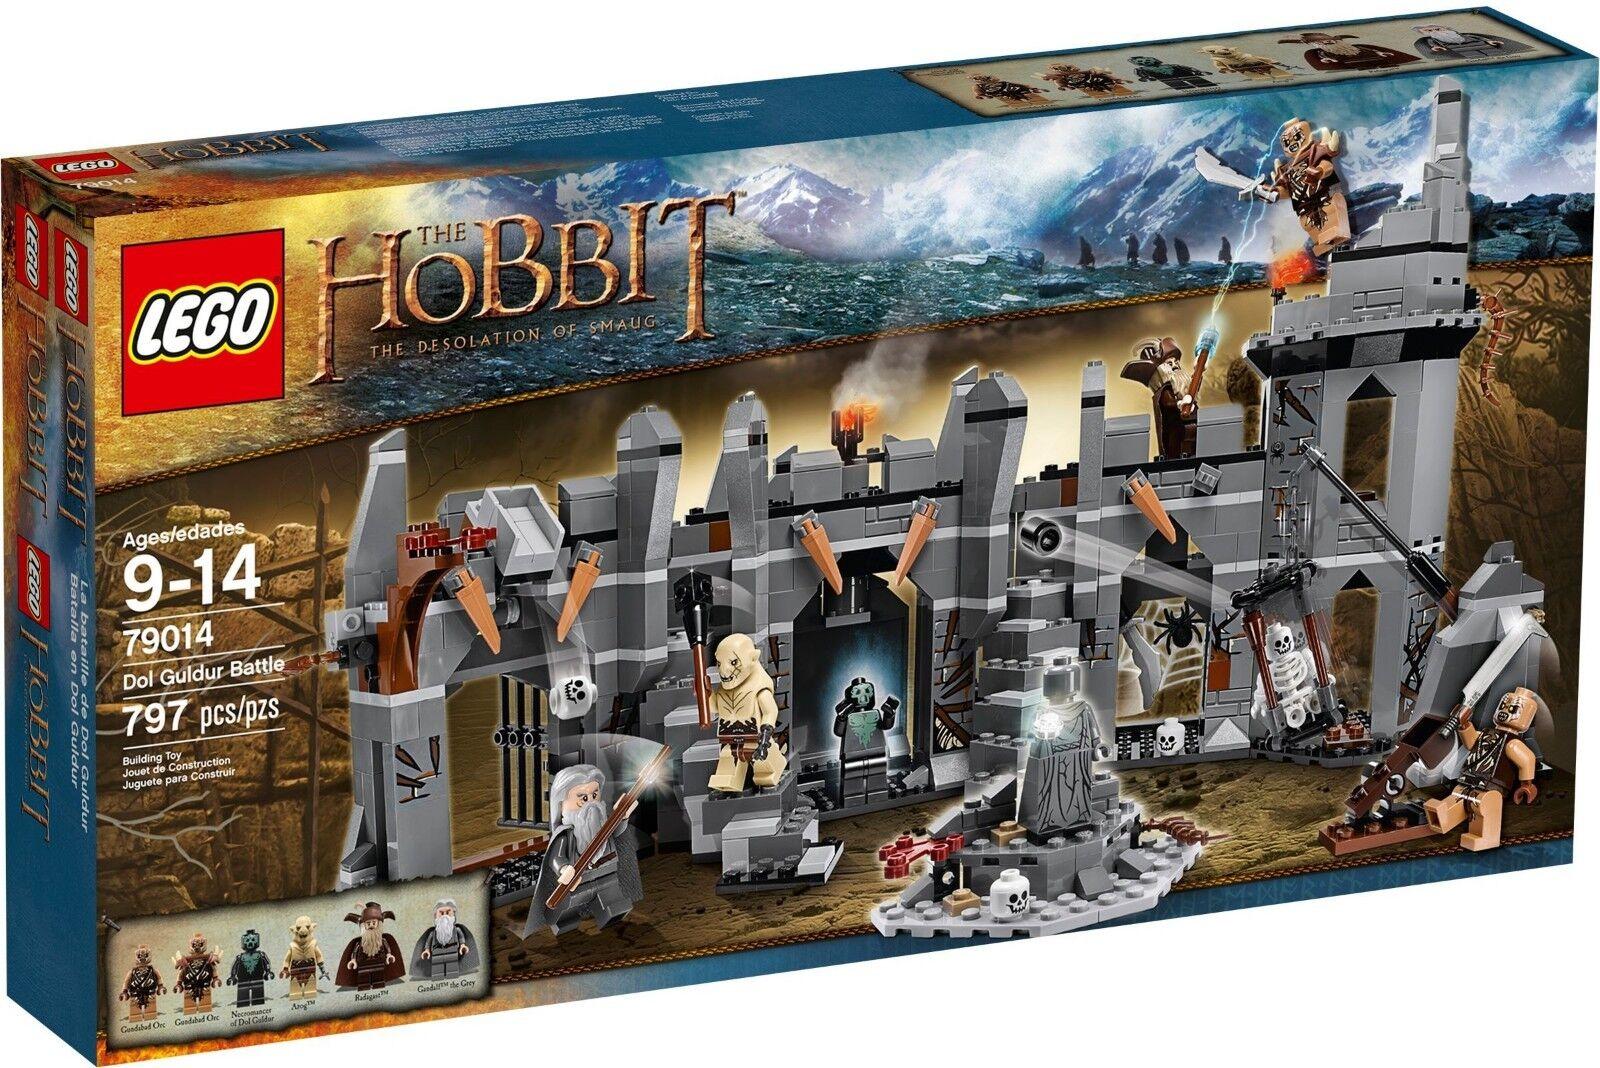 LEGO 79014 DOL GULDUR BATTLE THE HOBBIT LOTR RARE  RETIrot  BRAND NEW FAST SHIP